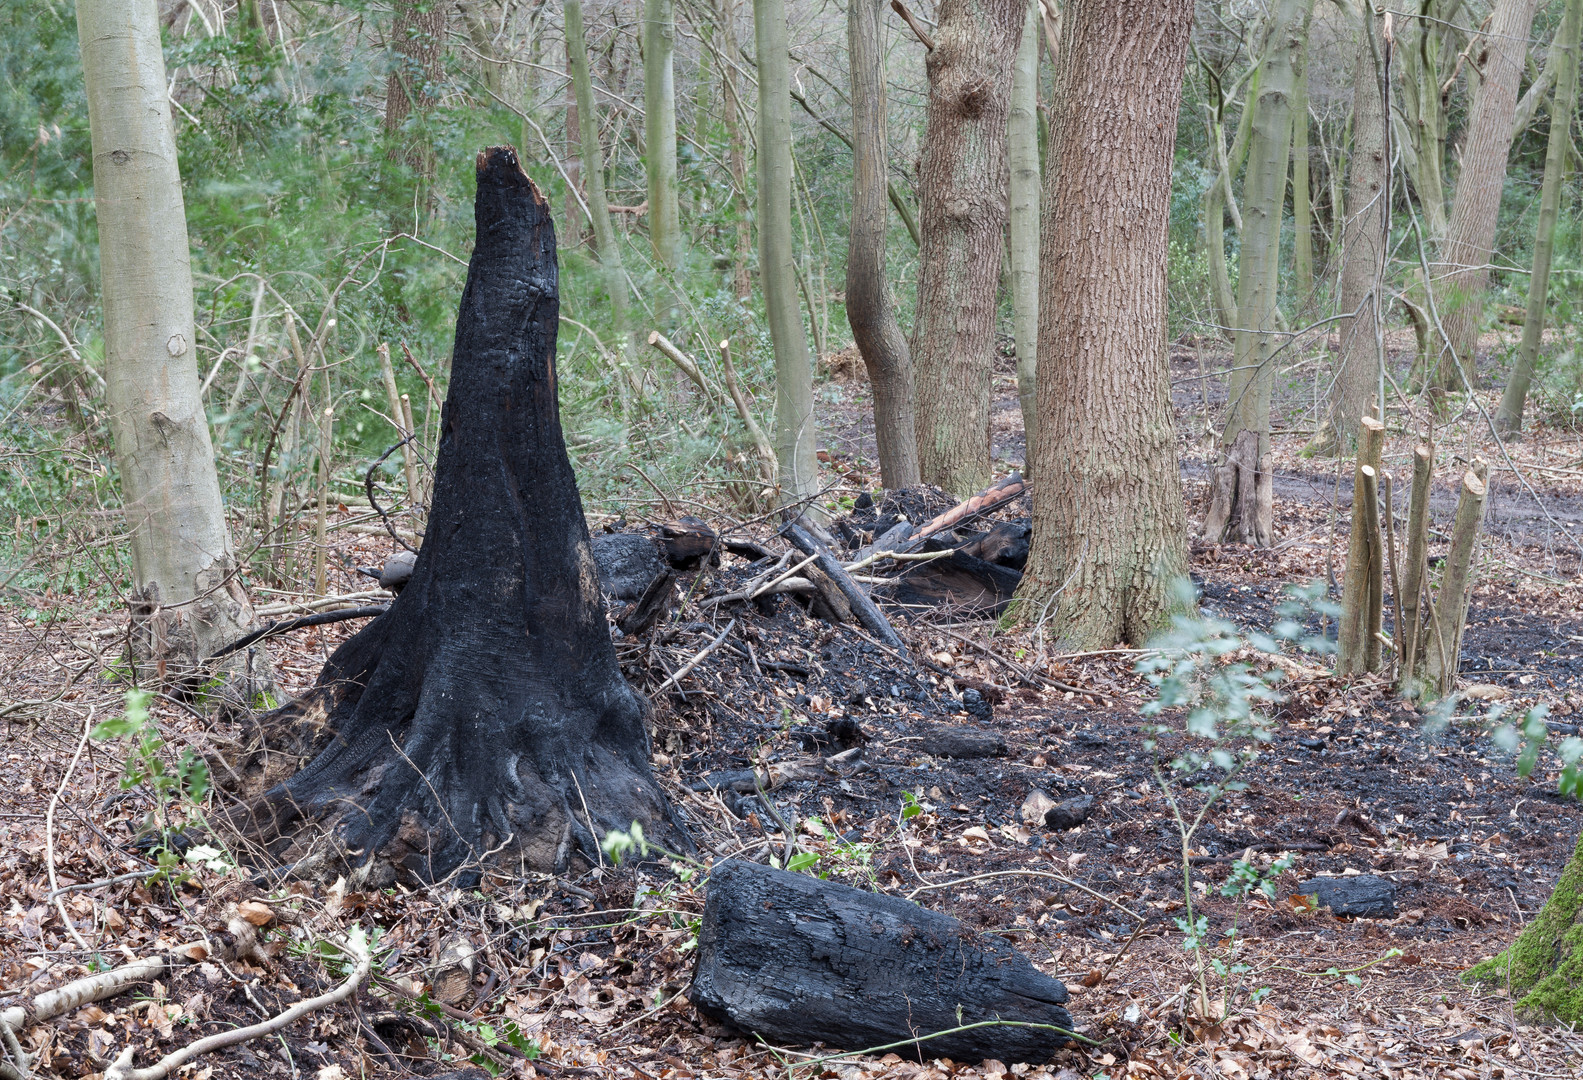 Charred and burnt tree stump, Wimbledon Common, London, England, UK